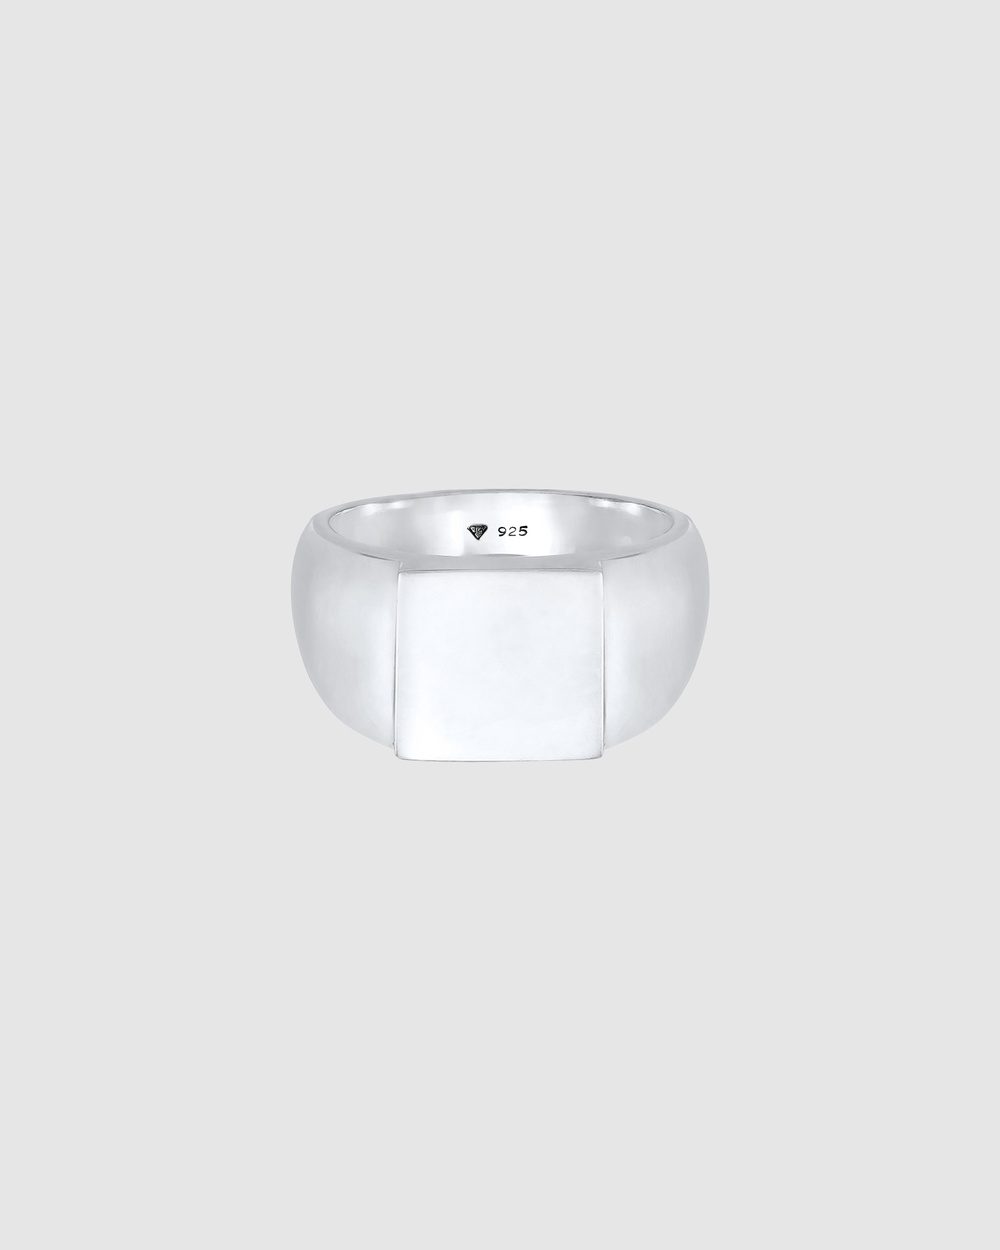 Kuzzoi Ring Signet Rectangular Gloss in 925 Sterling Silver Jewellery Silver